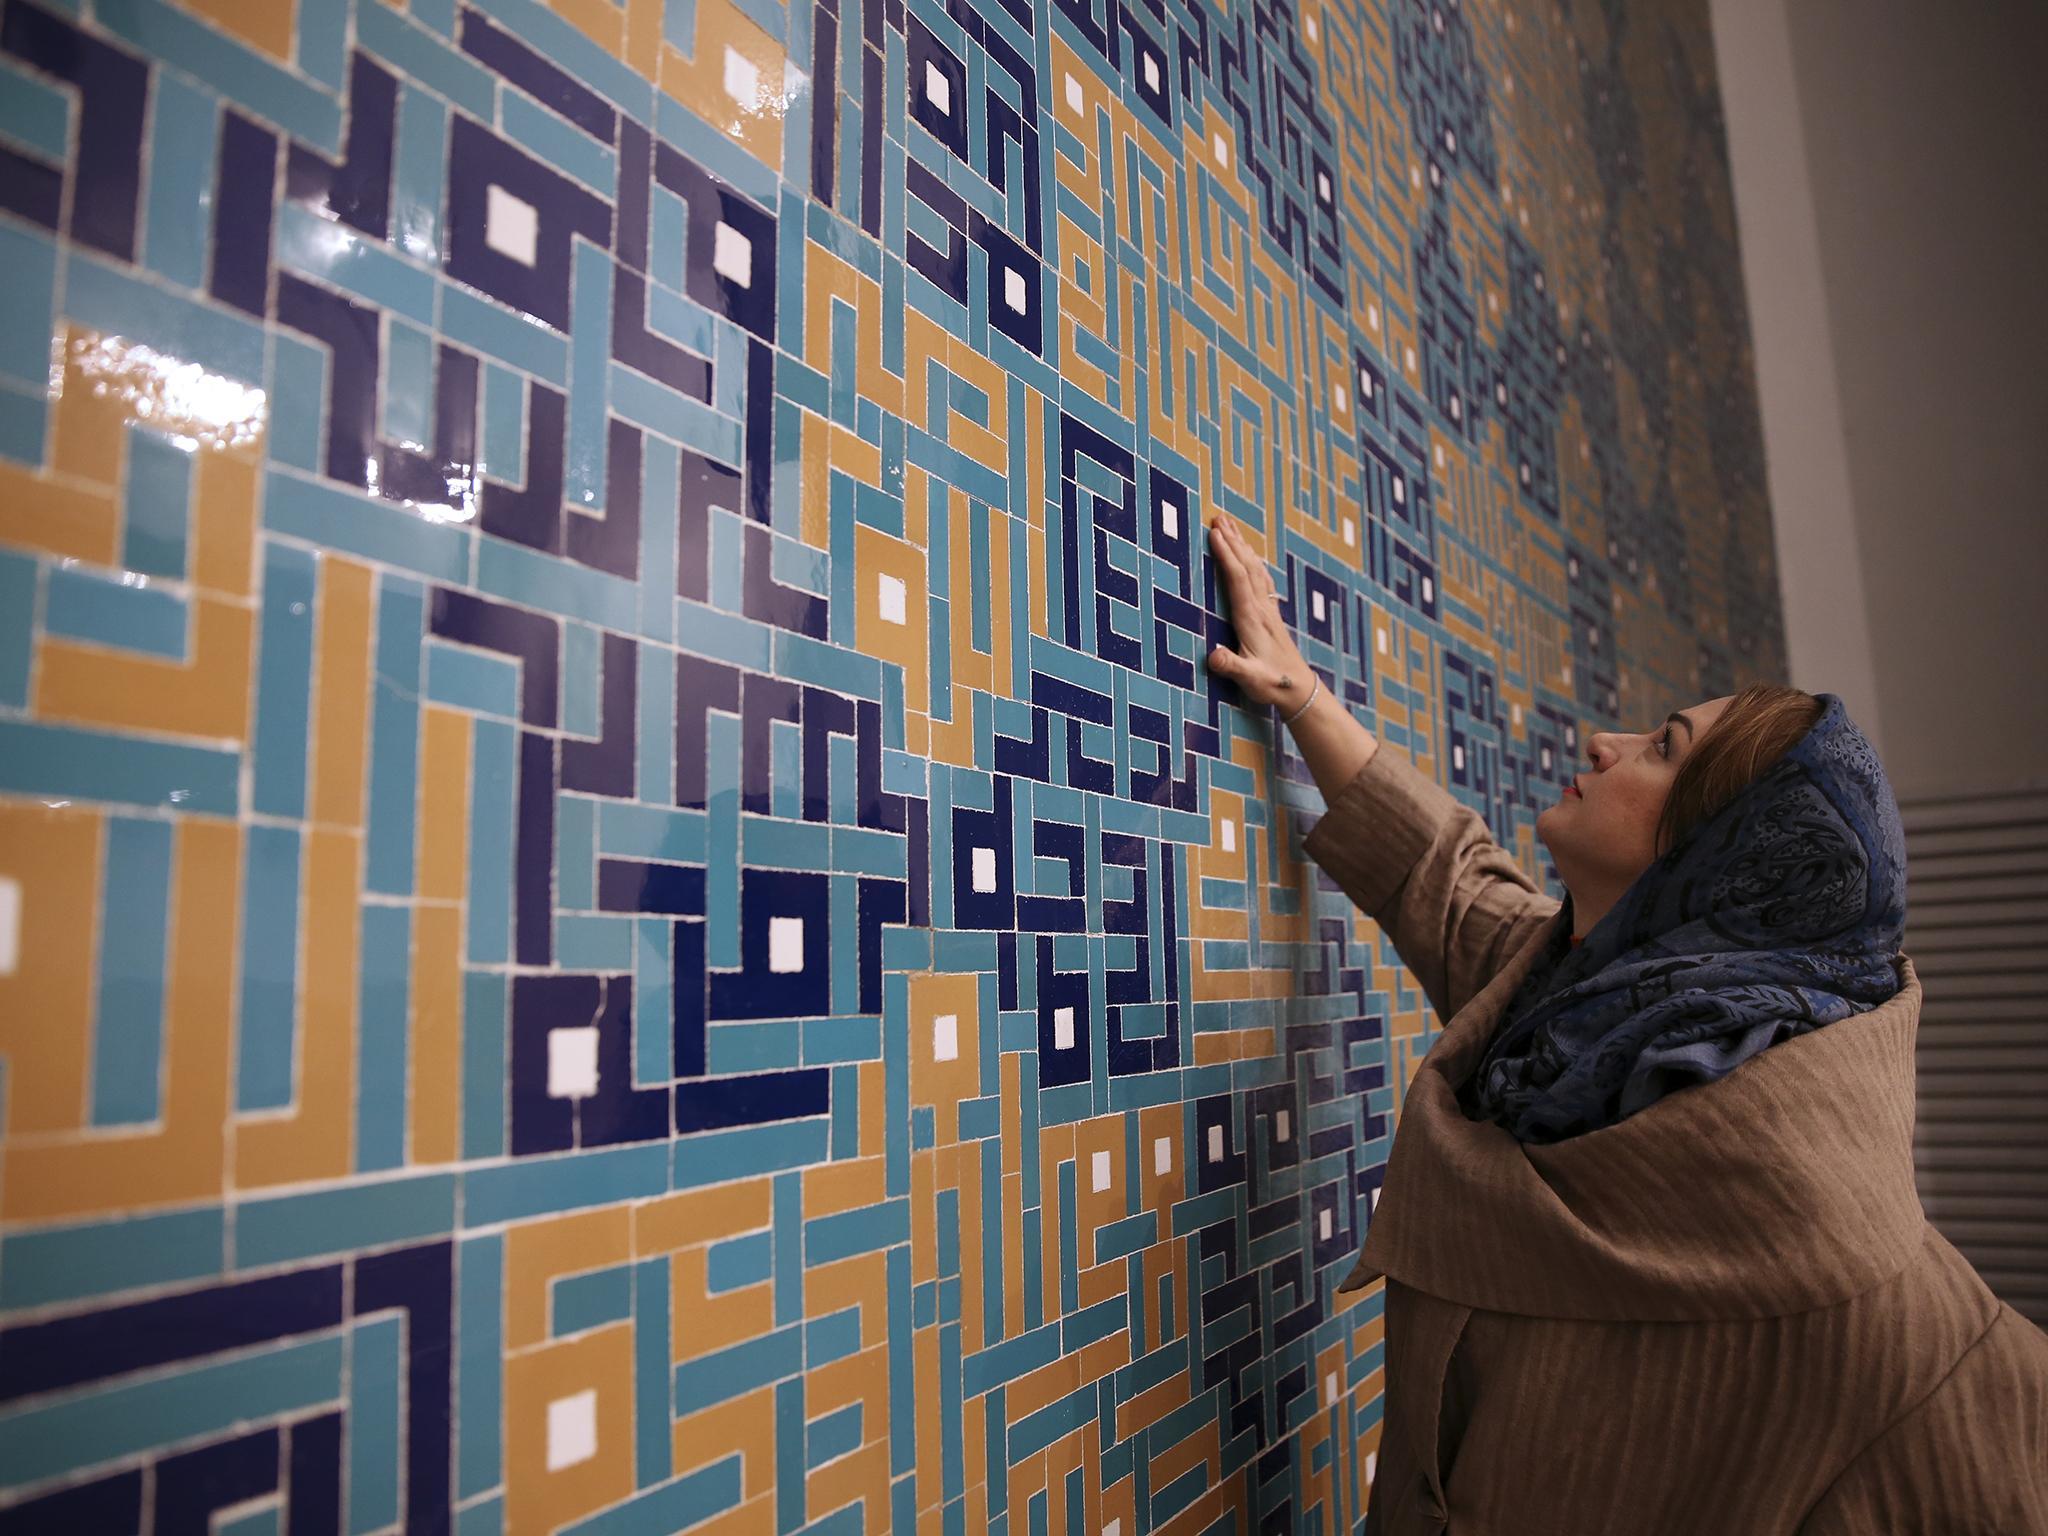 Avant-garde mosque in Iran infuriates religious hardliners